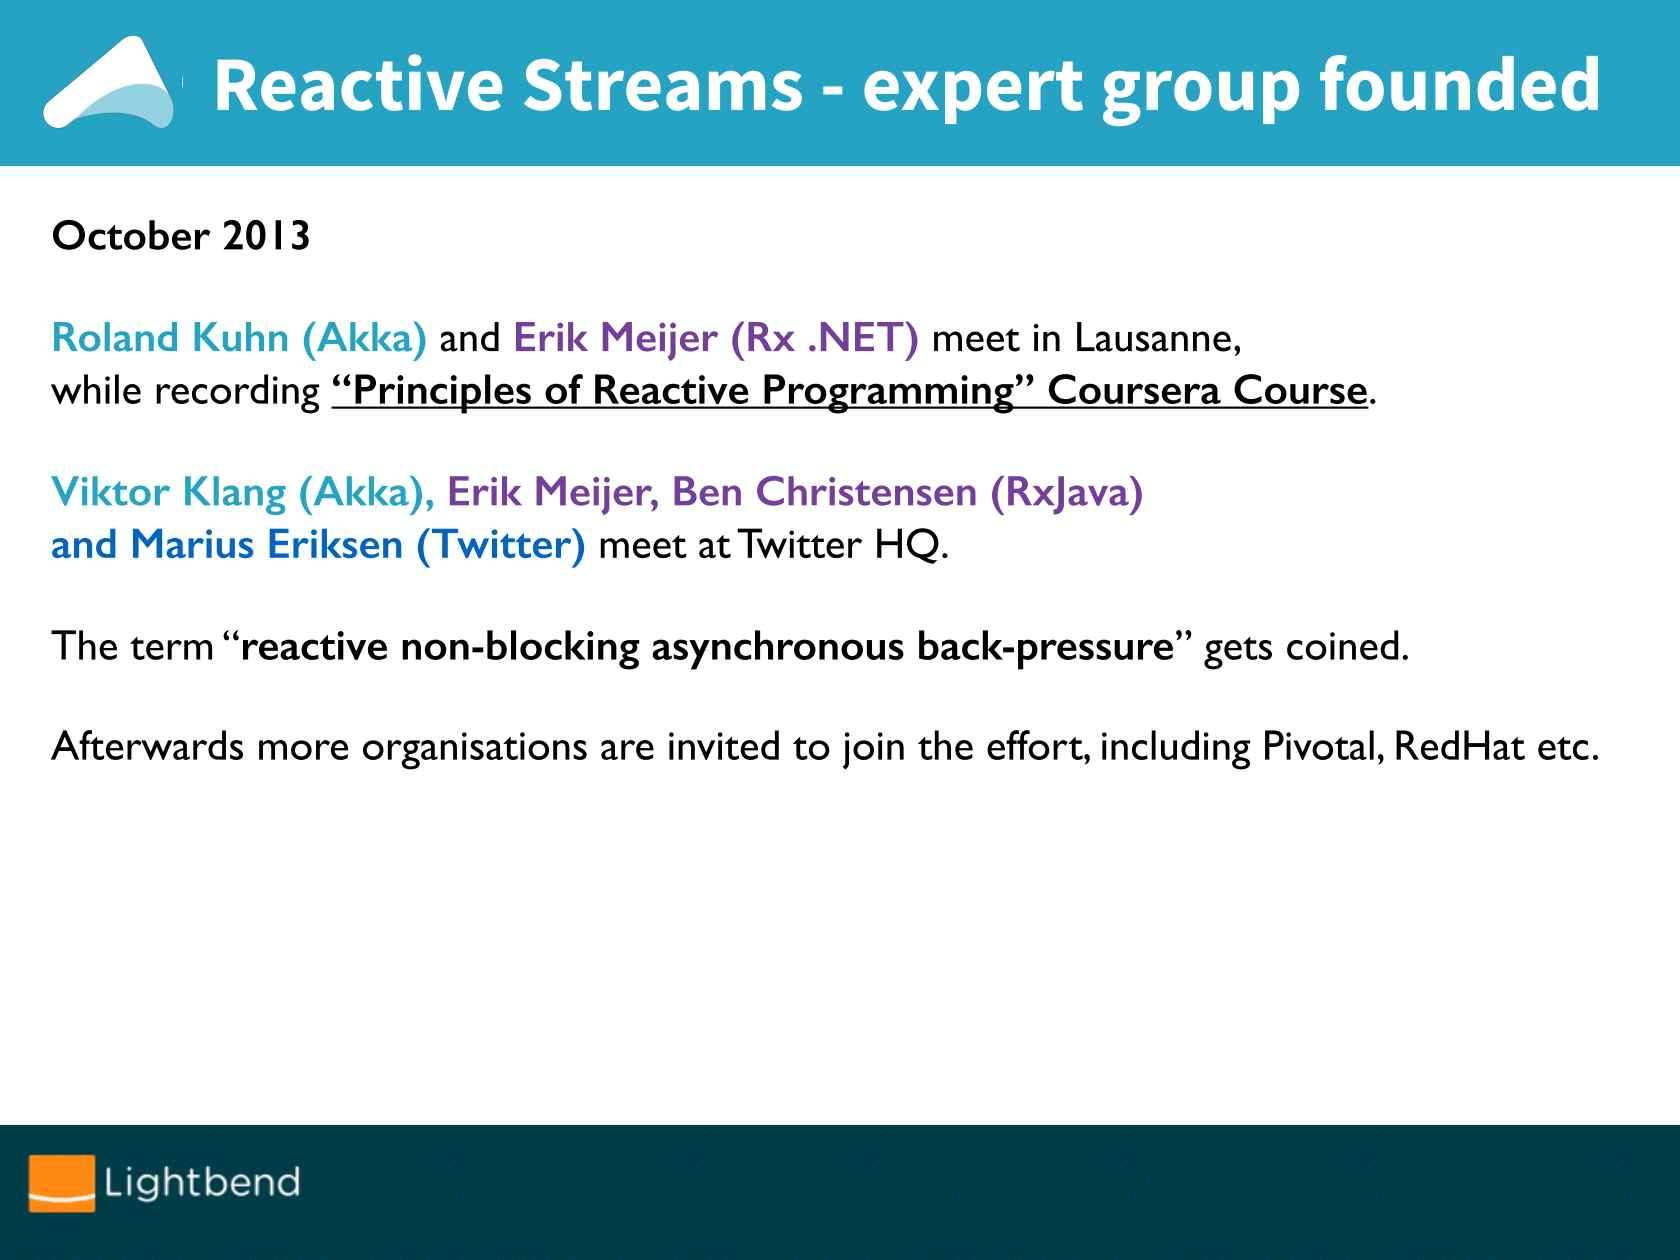 Reactive Streams, j u concurrent, & beyond!